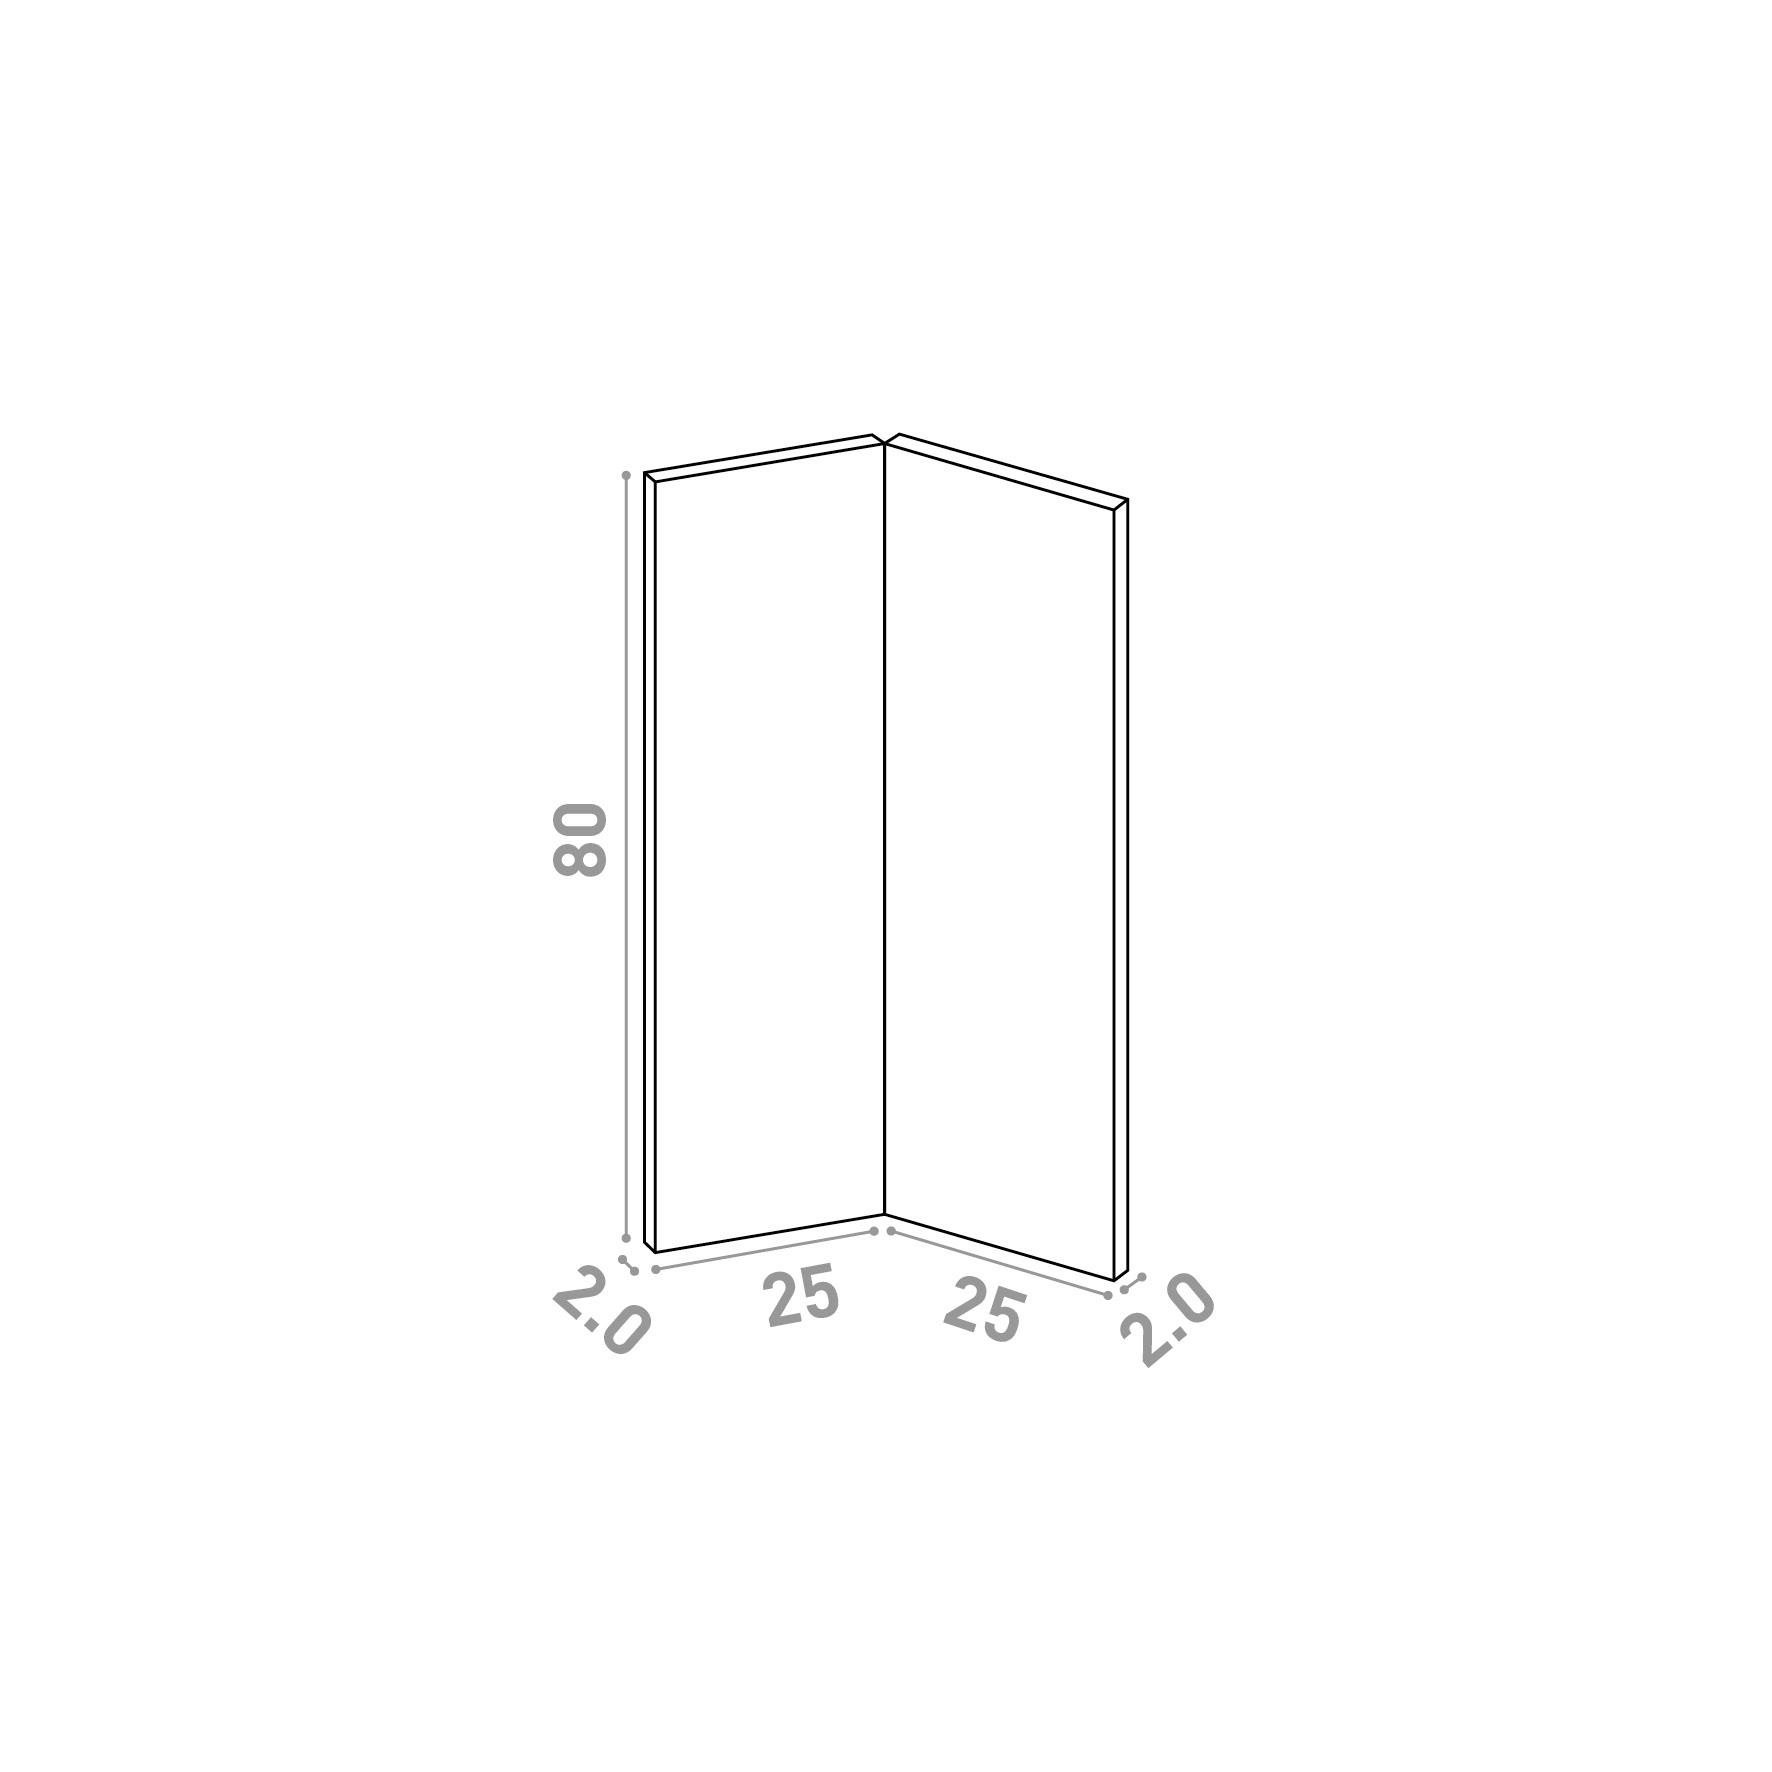 Porte d'angle 25x80cm   design lisse   chêne naturel